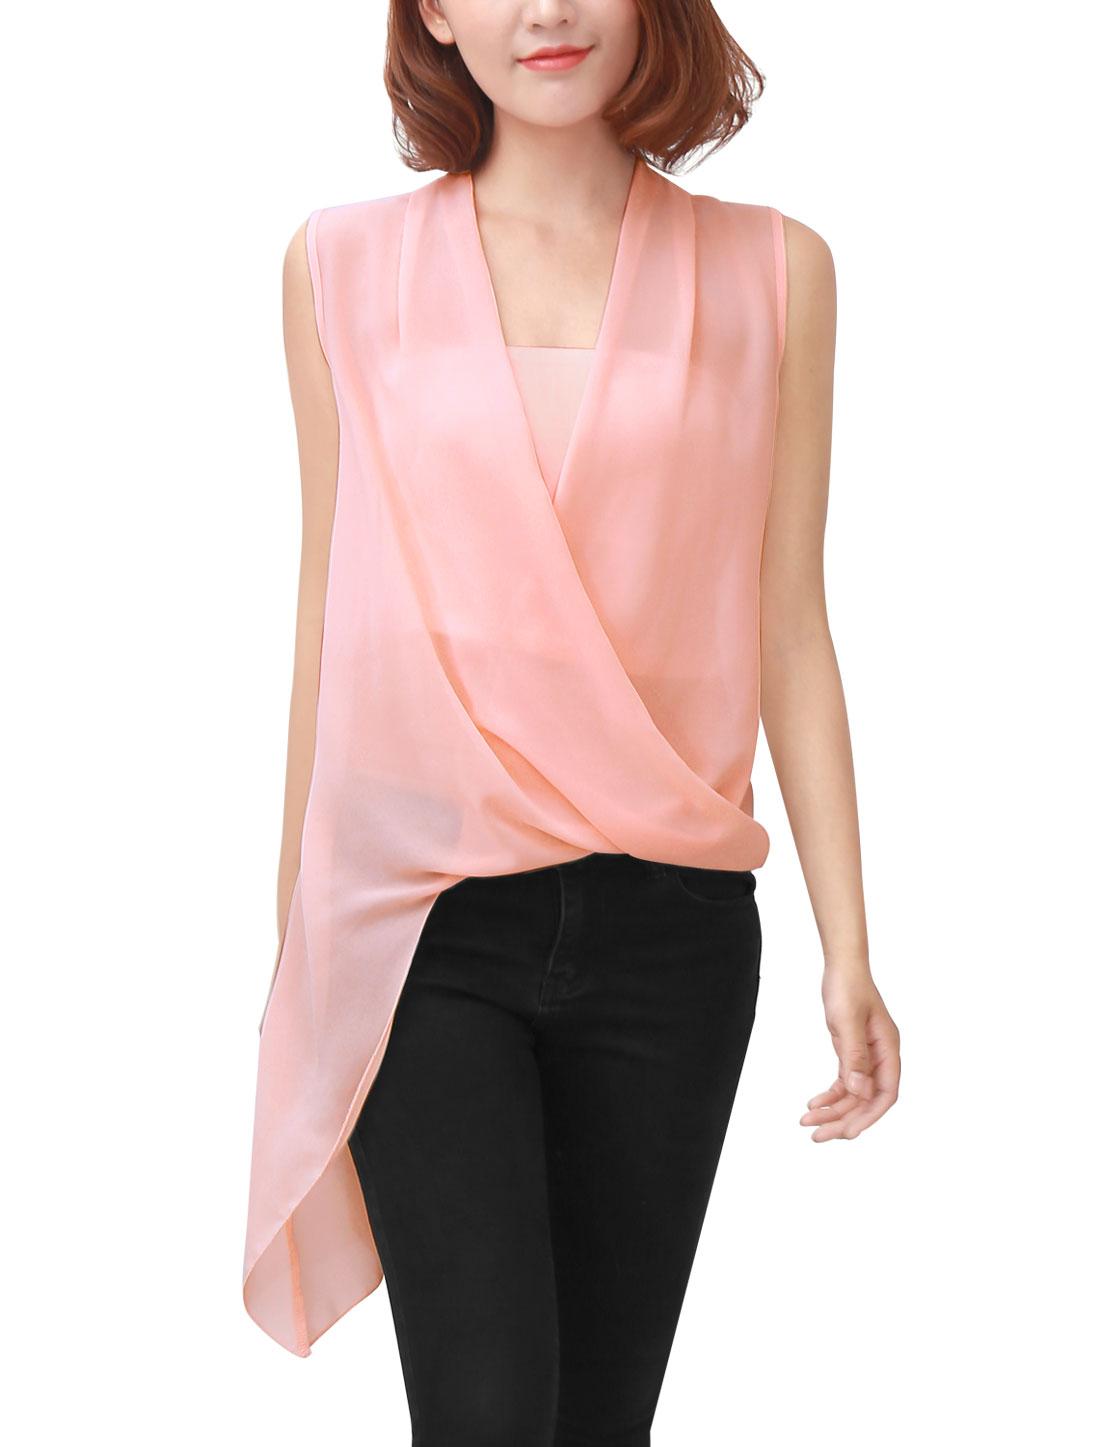 Women Sleeveless Asymmetric Hem Chiffon Blouse w Tube Top Nude Pink XL